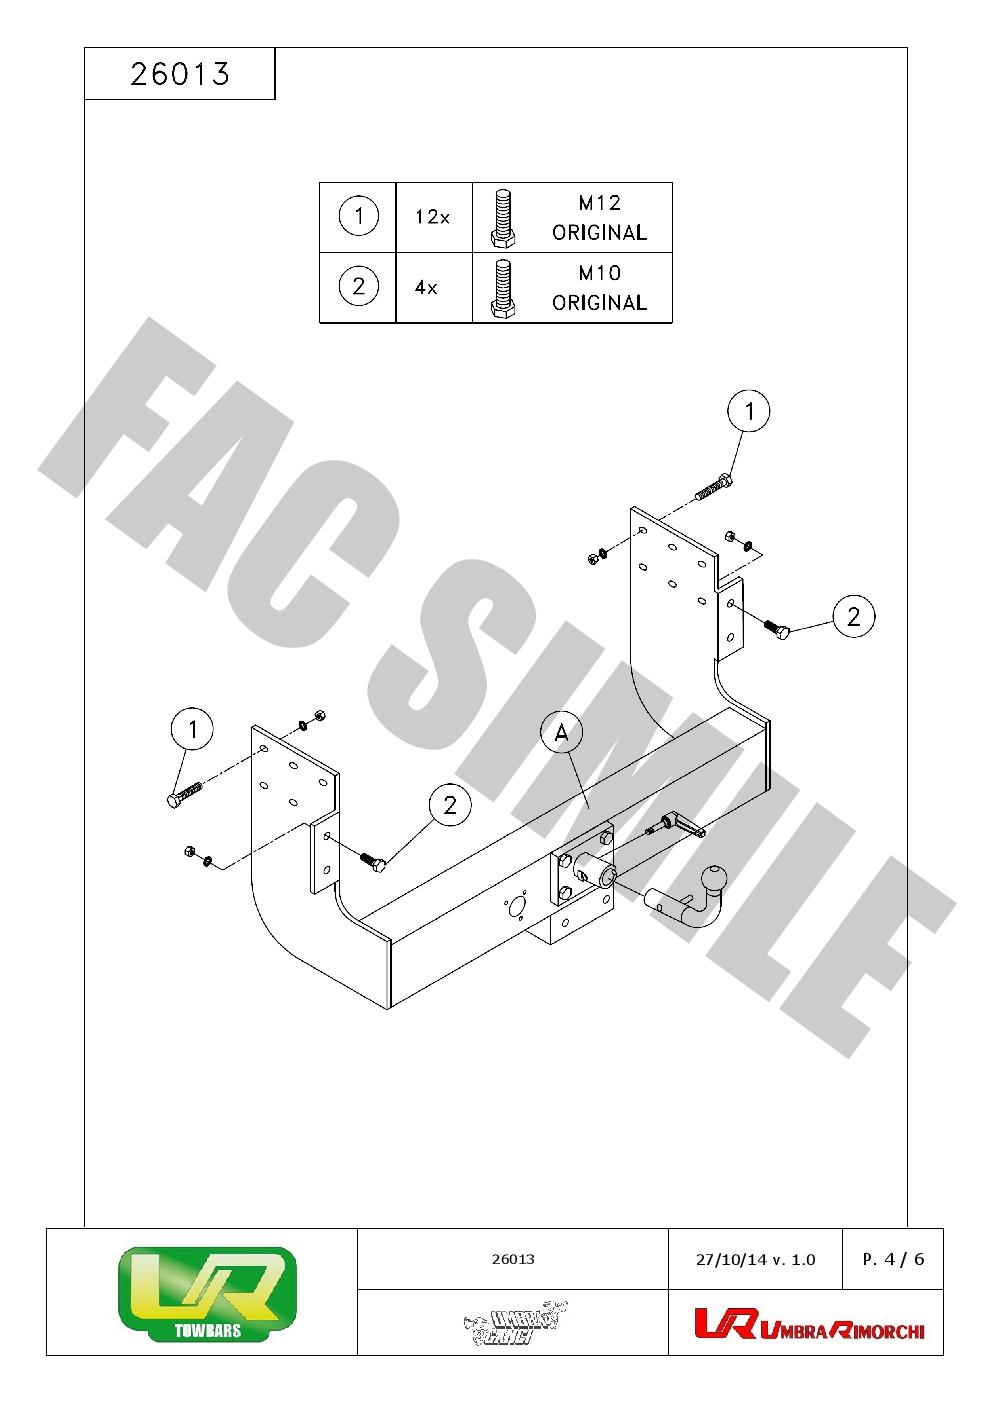 Flange Towbar + 7 pin Electrics for Nissan Navara NP300